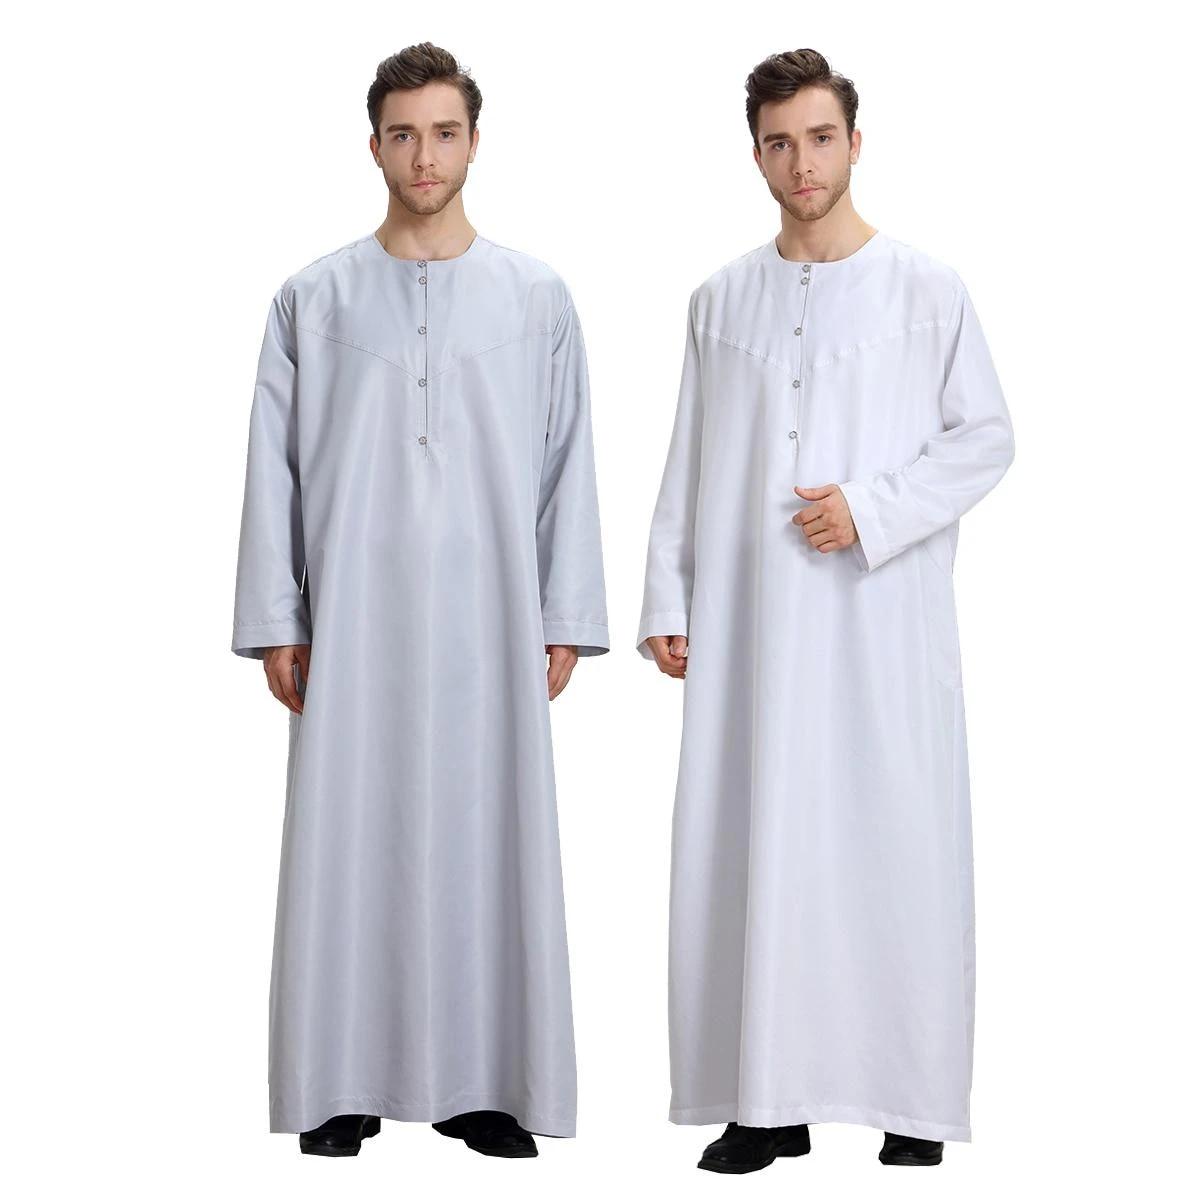 58-62 Mens Saudi Style White Thobe Arab Robe dishdash Islamic Clothing Jubba